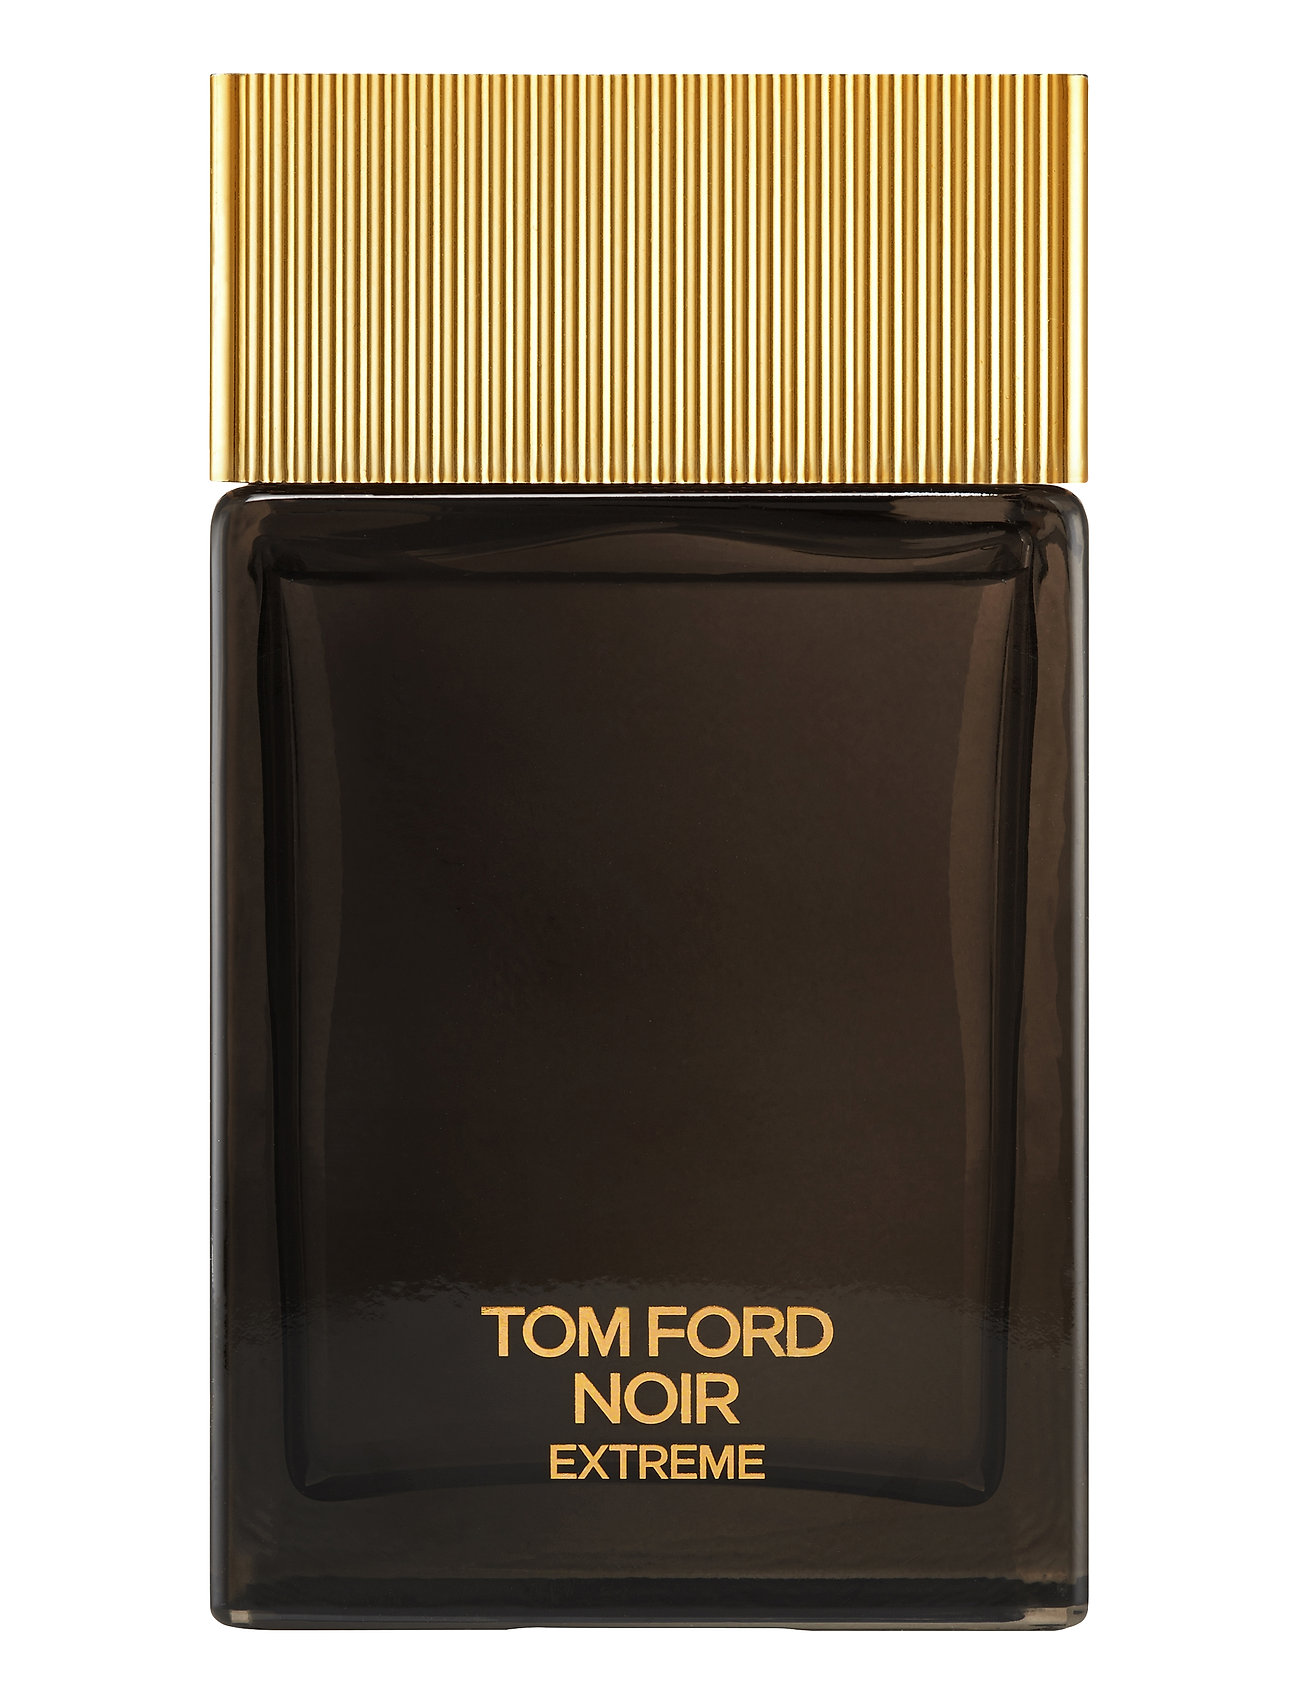 Tom ford noir extreme eau de parfum fra tom ford på boozt.com dk